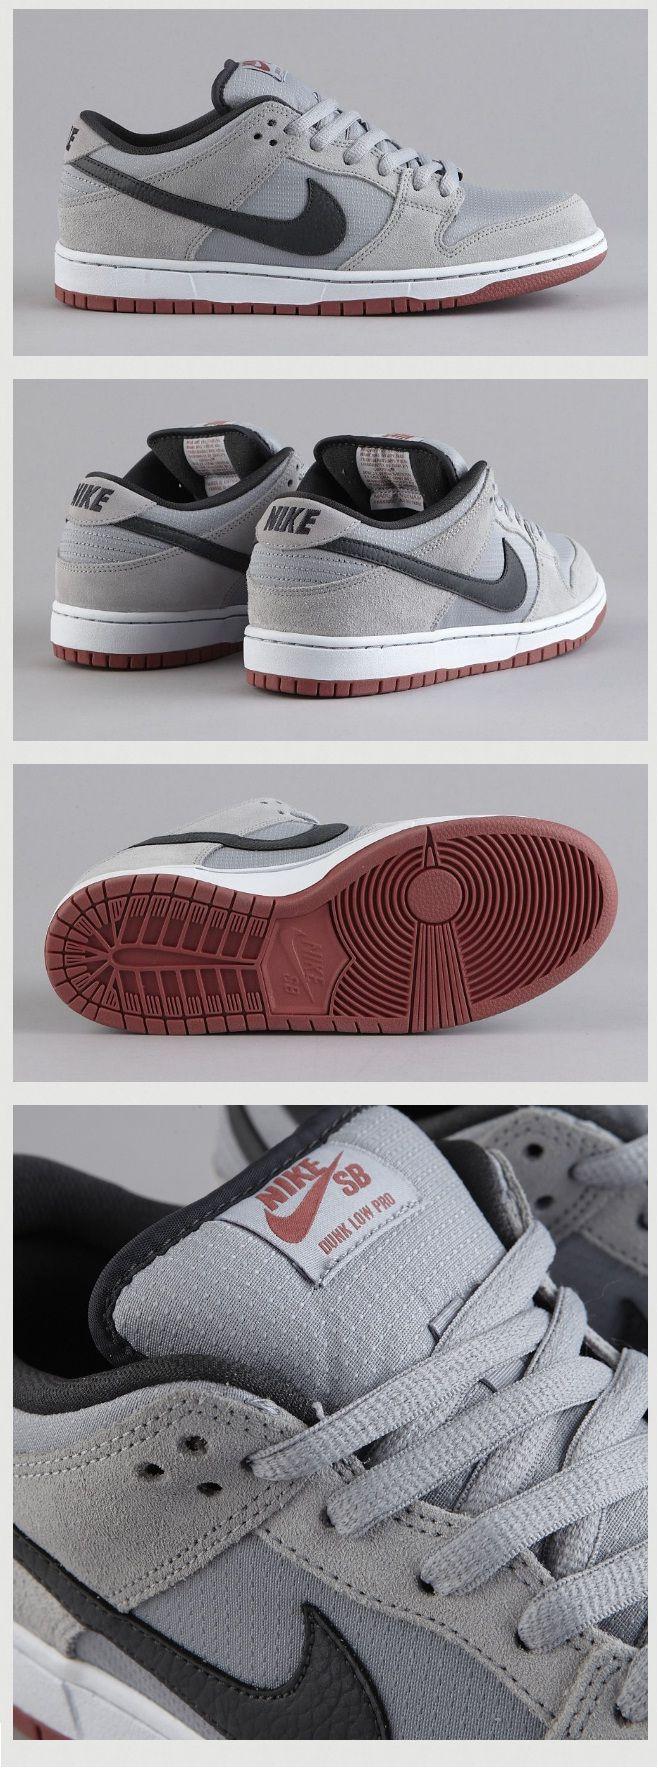 Nike SB Dunk Pro Low - Wolf Grey